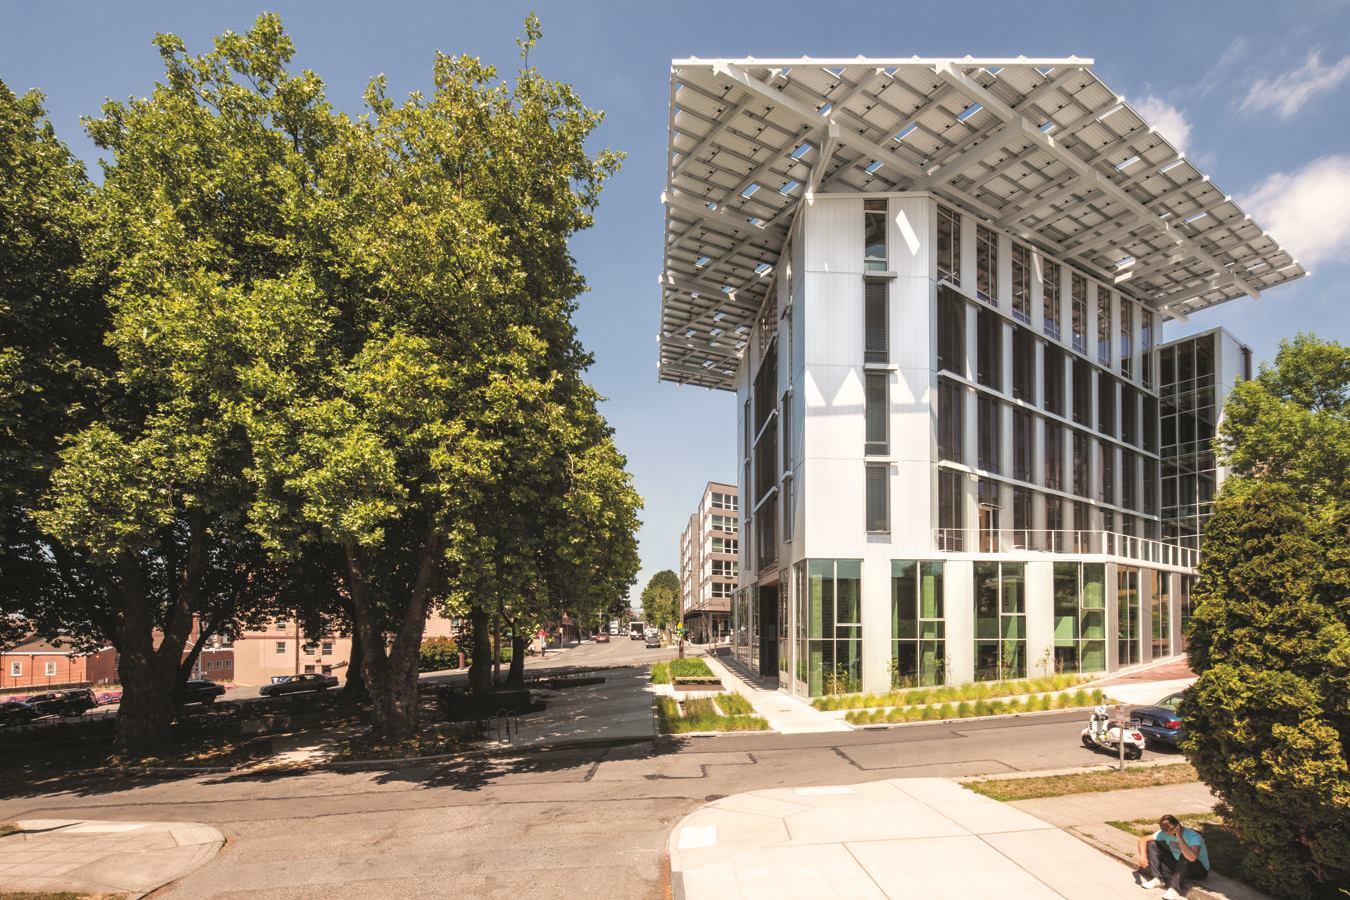 What 39 s with net zero enthusiasm for net zero building - Green design ...